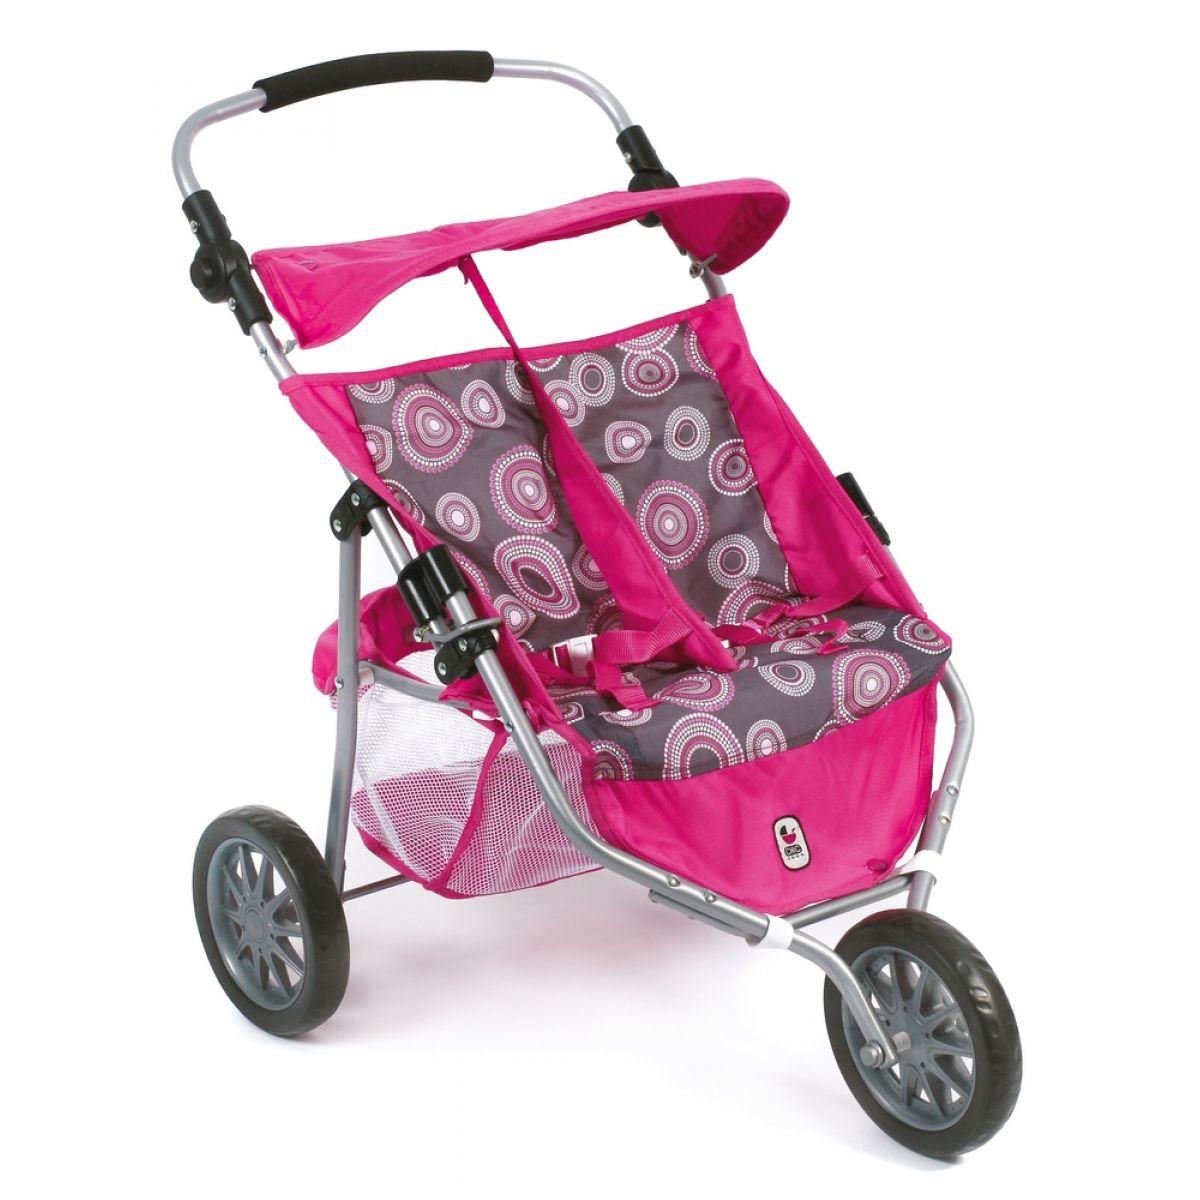 Bayer Chic Kočárek pro panenky Jogger - Hot pink pearls